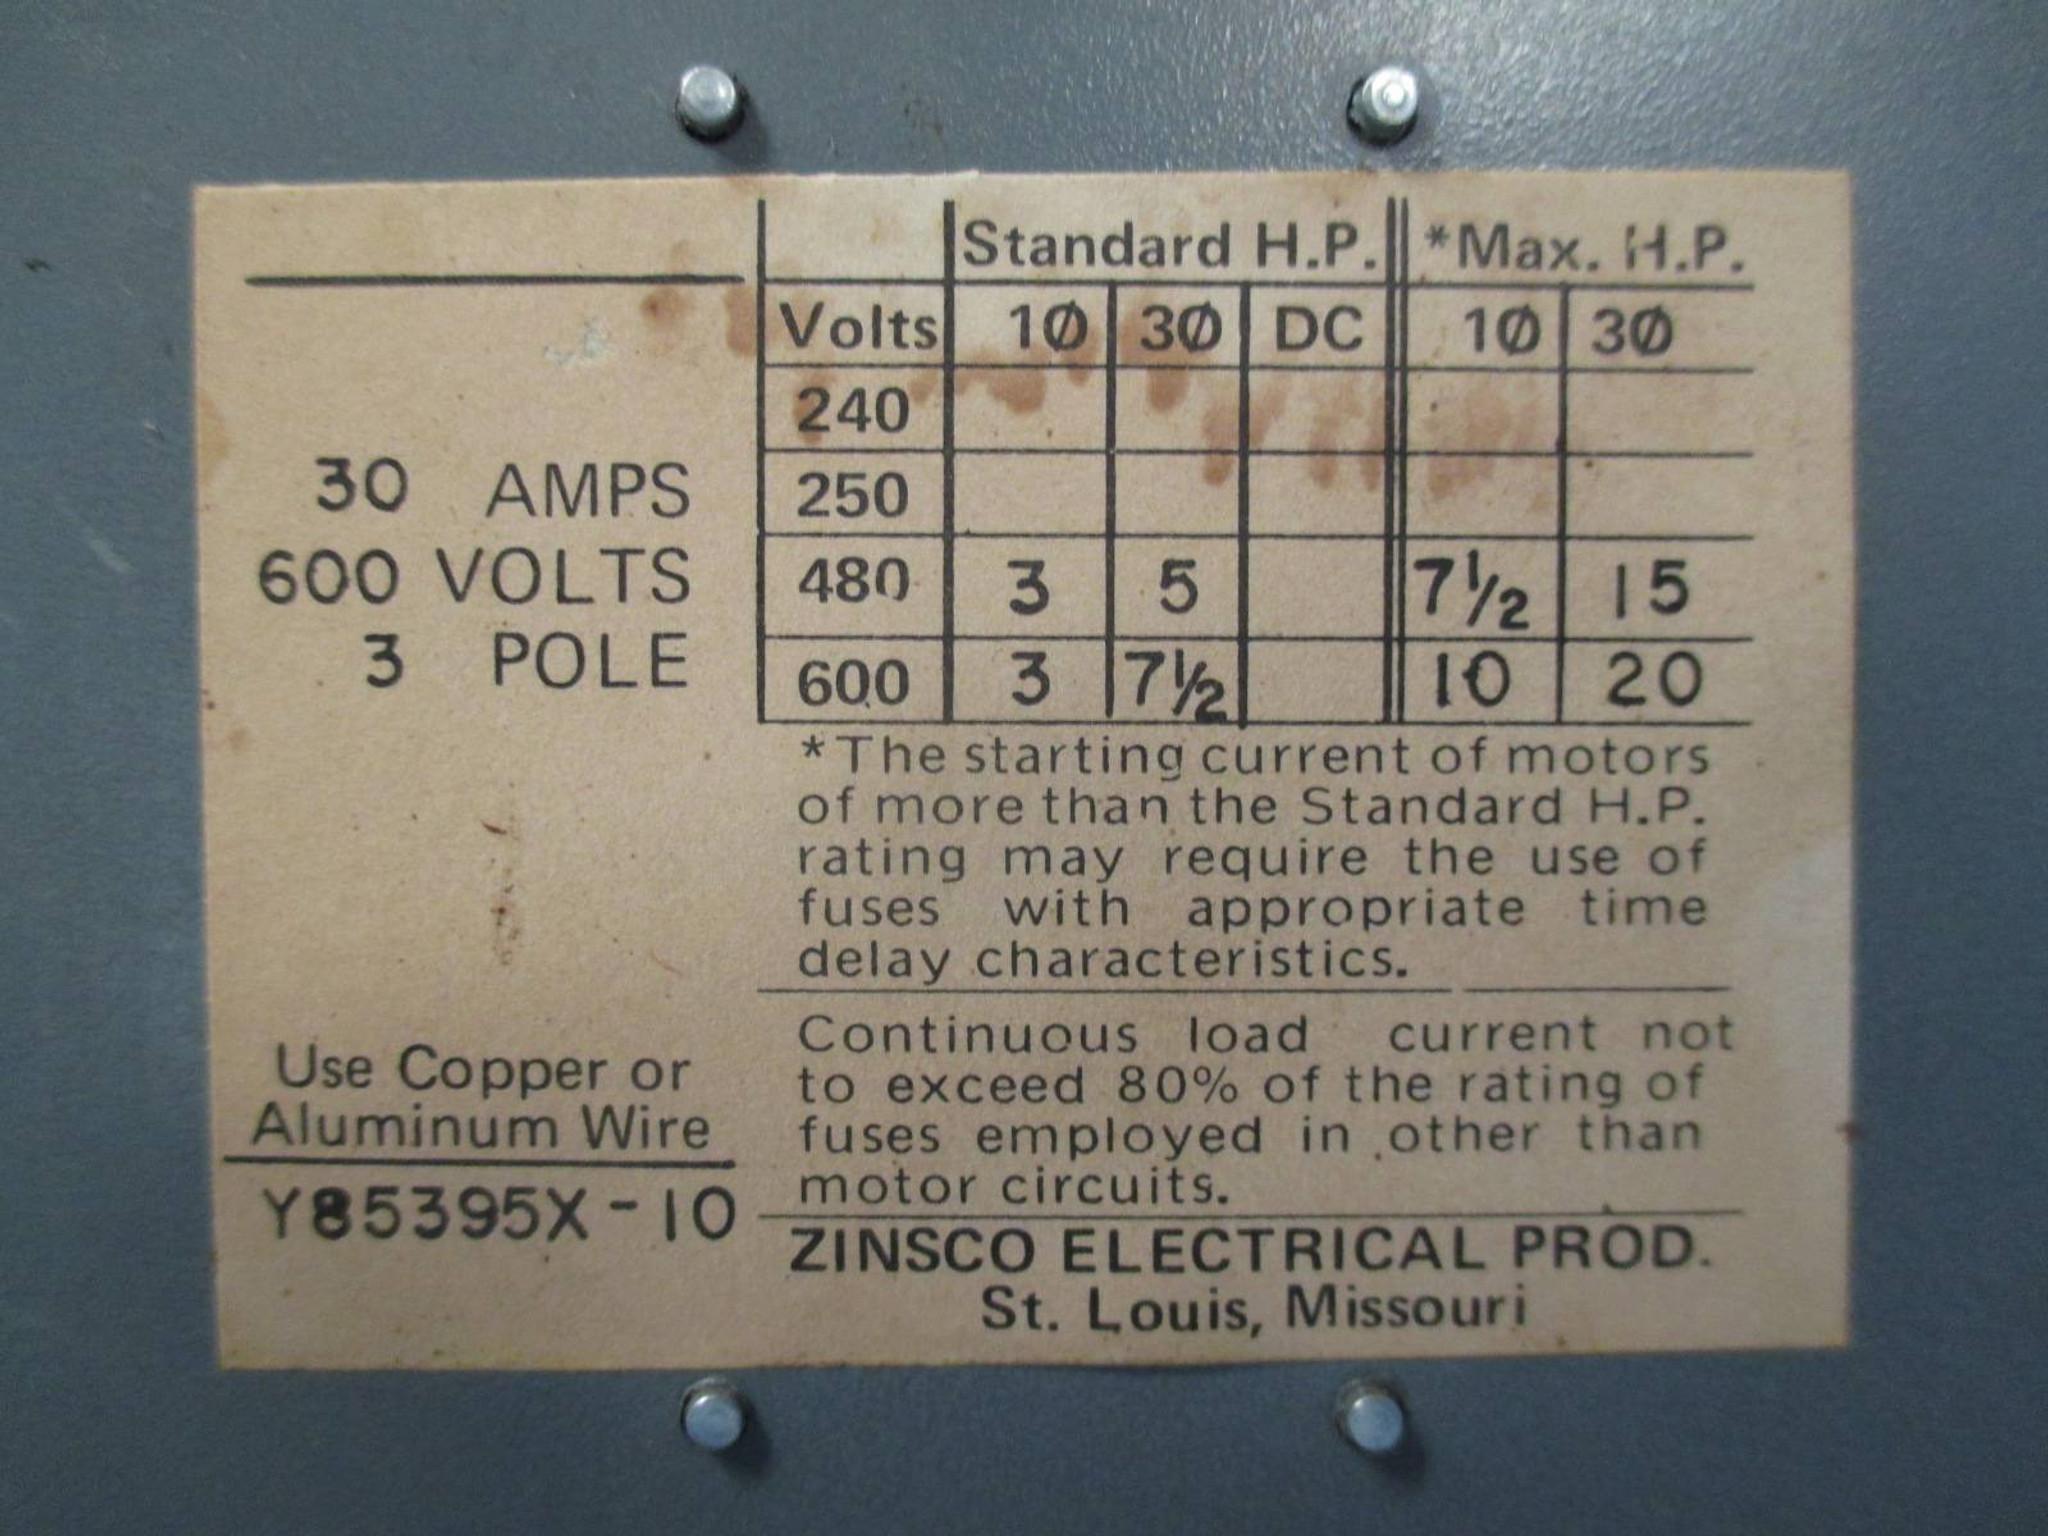 Zinsco Qsf Unit 30 Amp 600v Qsft353b Fusible Panelboard Switch Qsft Fuse Box Https D3d71ba2asa5ozcloudfrontnet 12014161 Images Tk0431